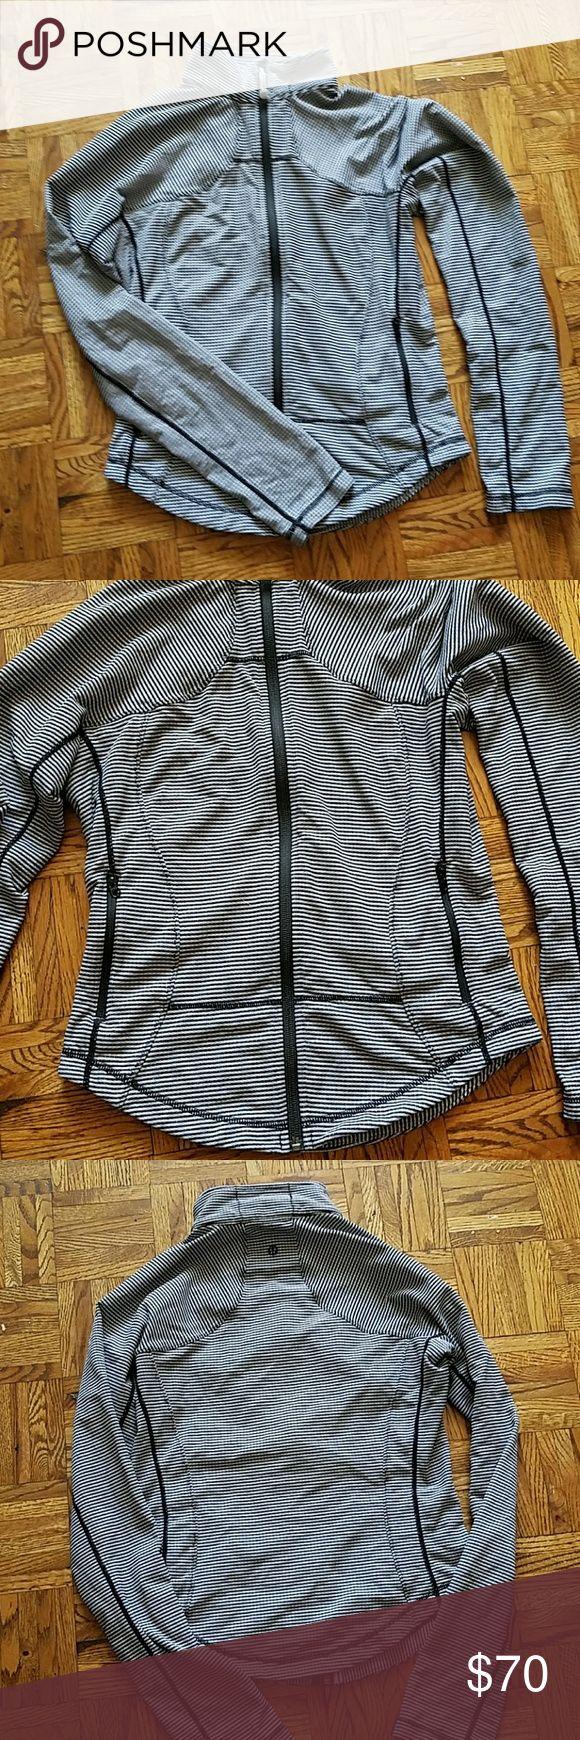 Lululemon black and white jacket Striped almonst hounds tooth pattern lululemon jacket. Zips up the neck. Side pockets. Perfect condition. Size 8 lululemon athletica Jackets & Coats